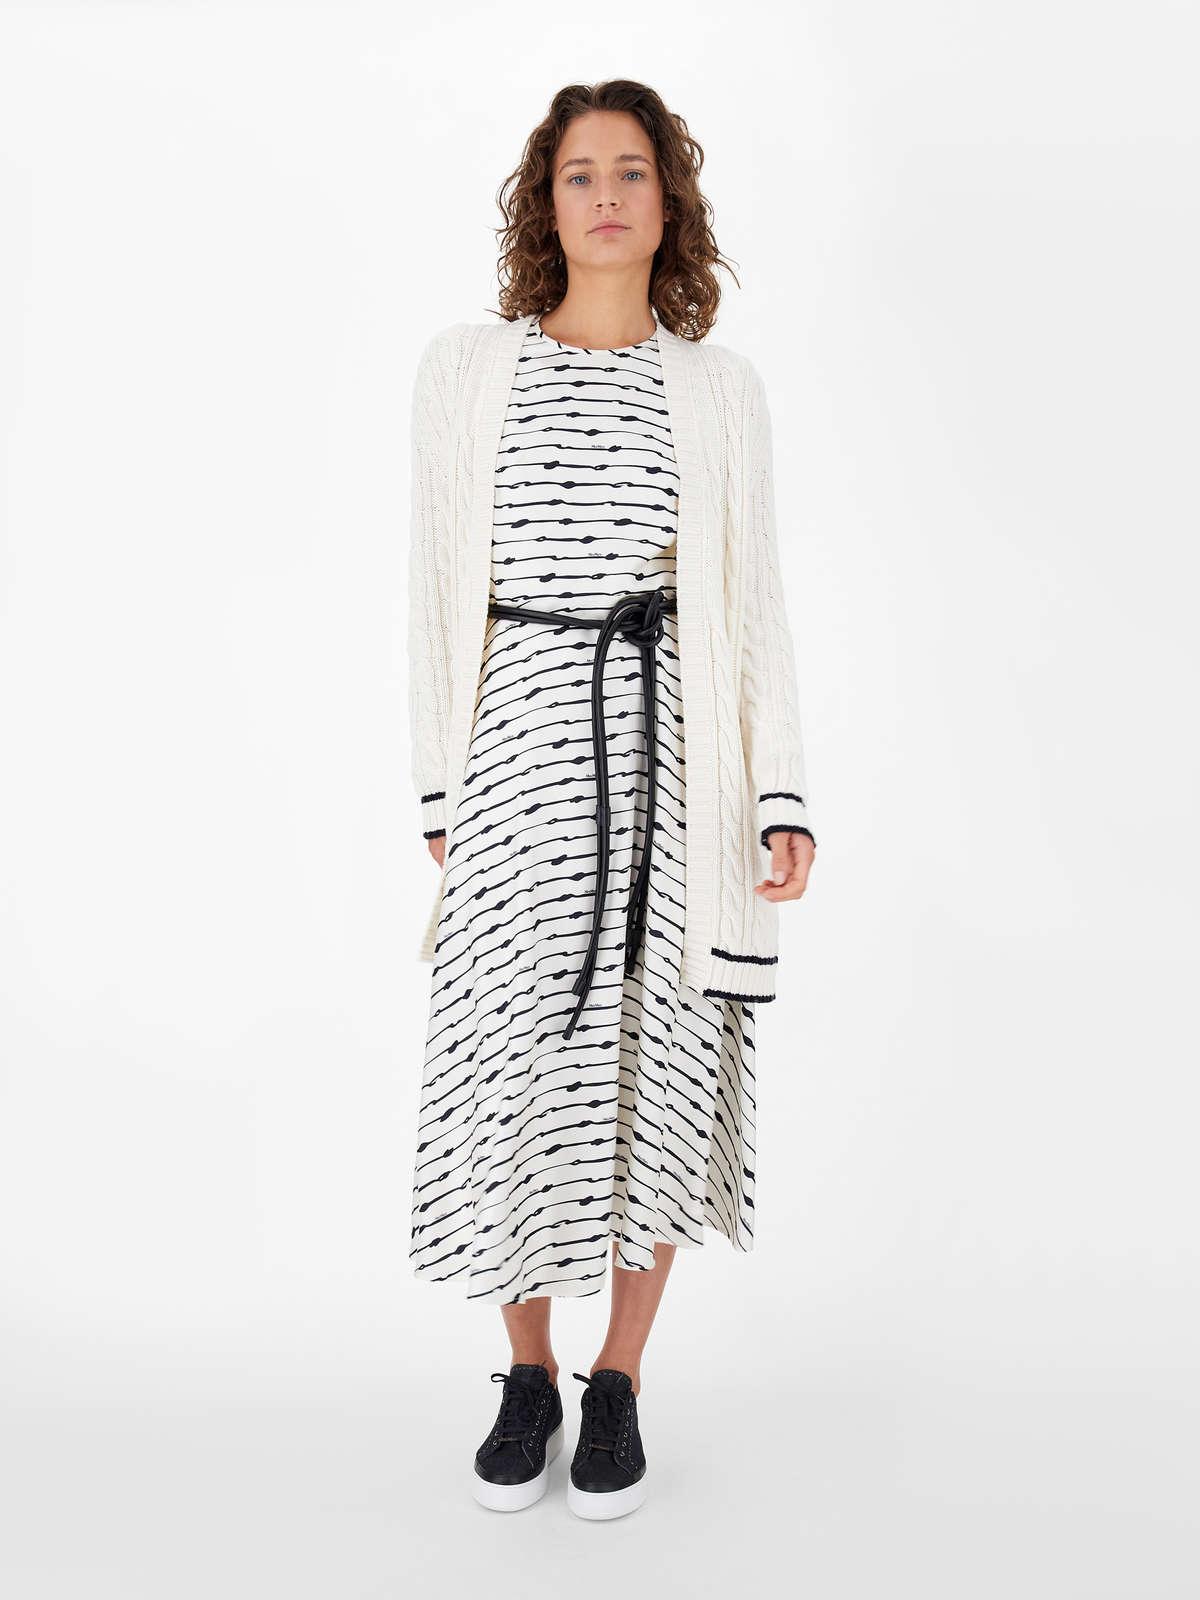 Cotton, cashmere and silk yarn cardigan - Max Mara